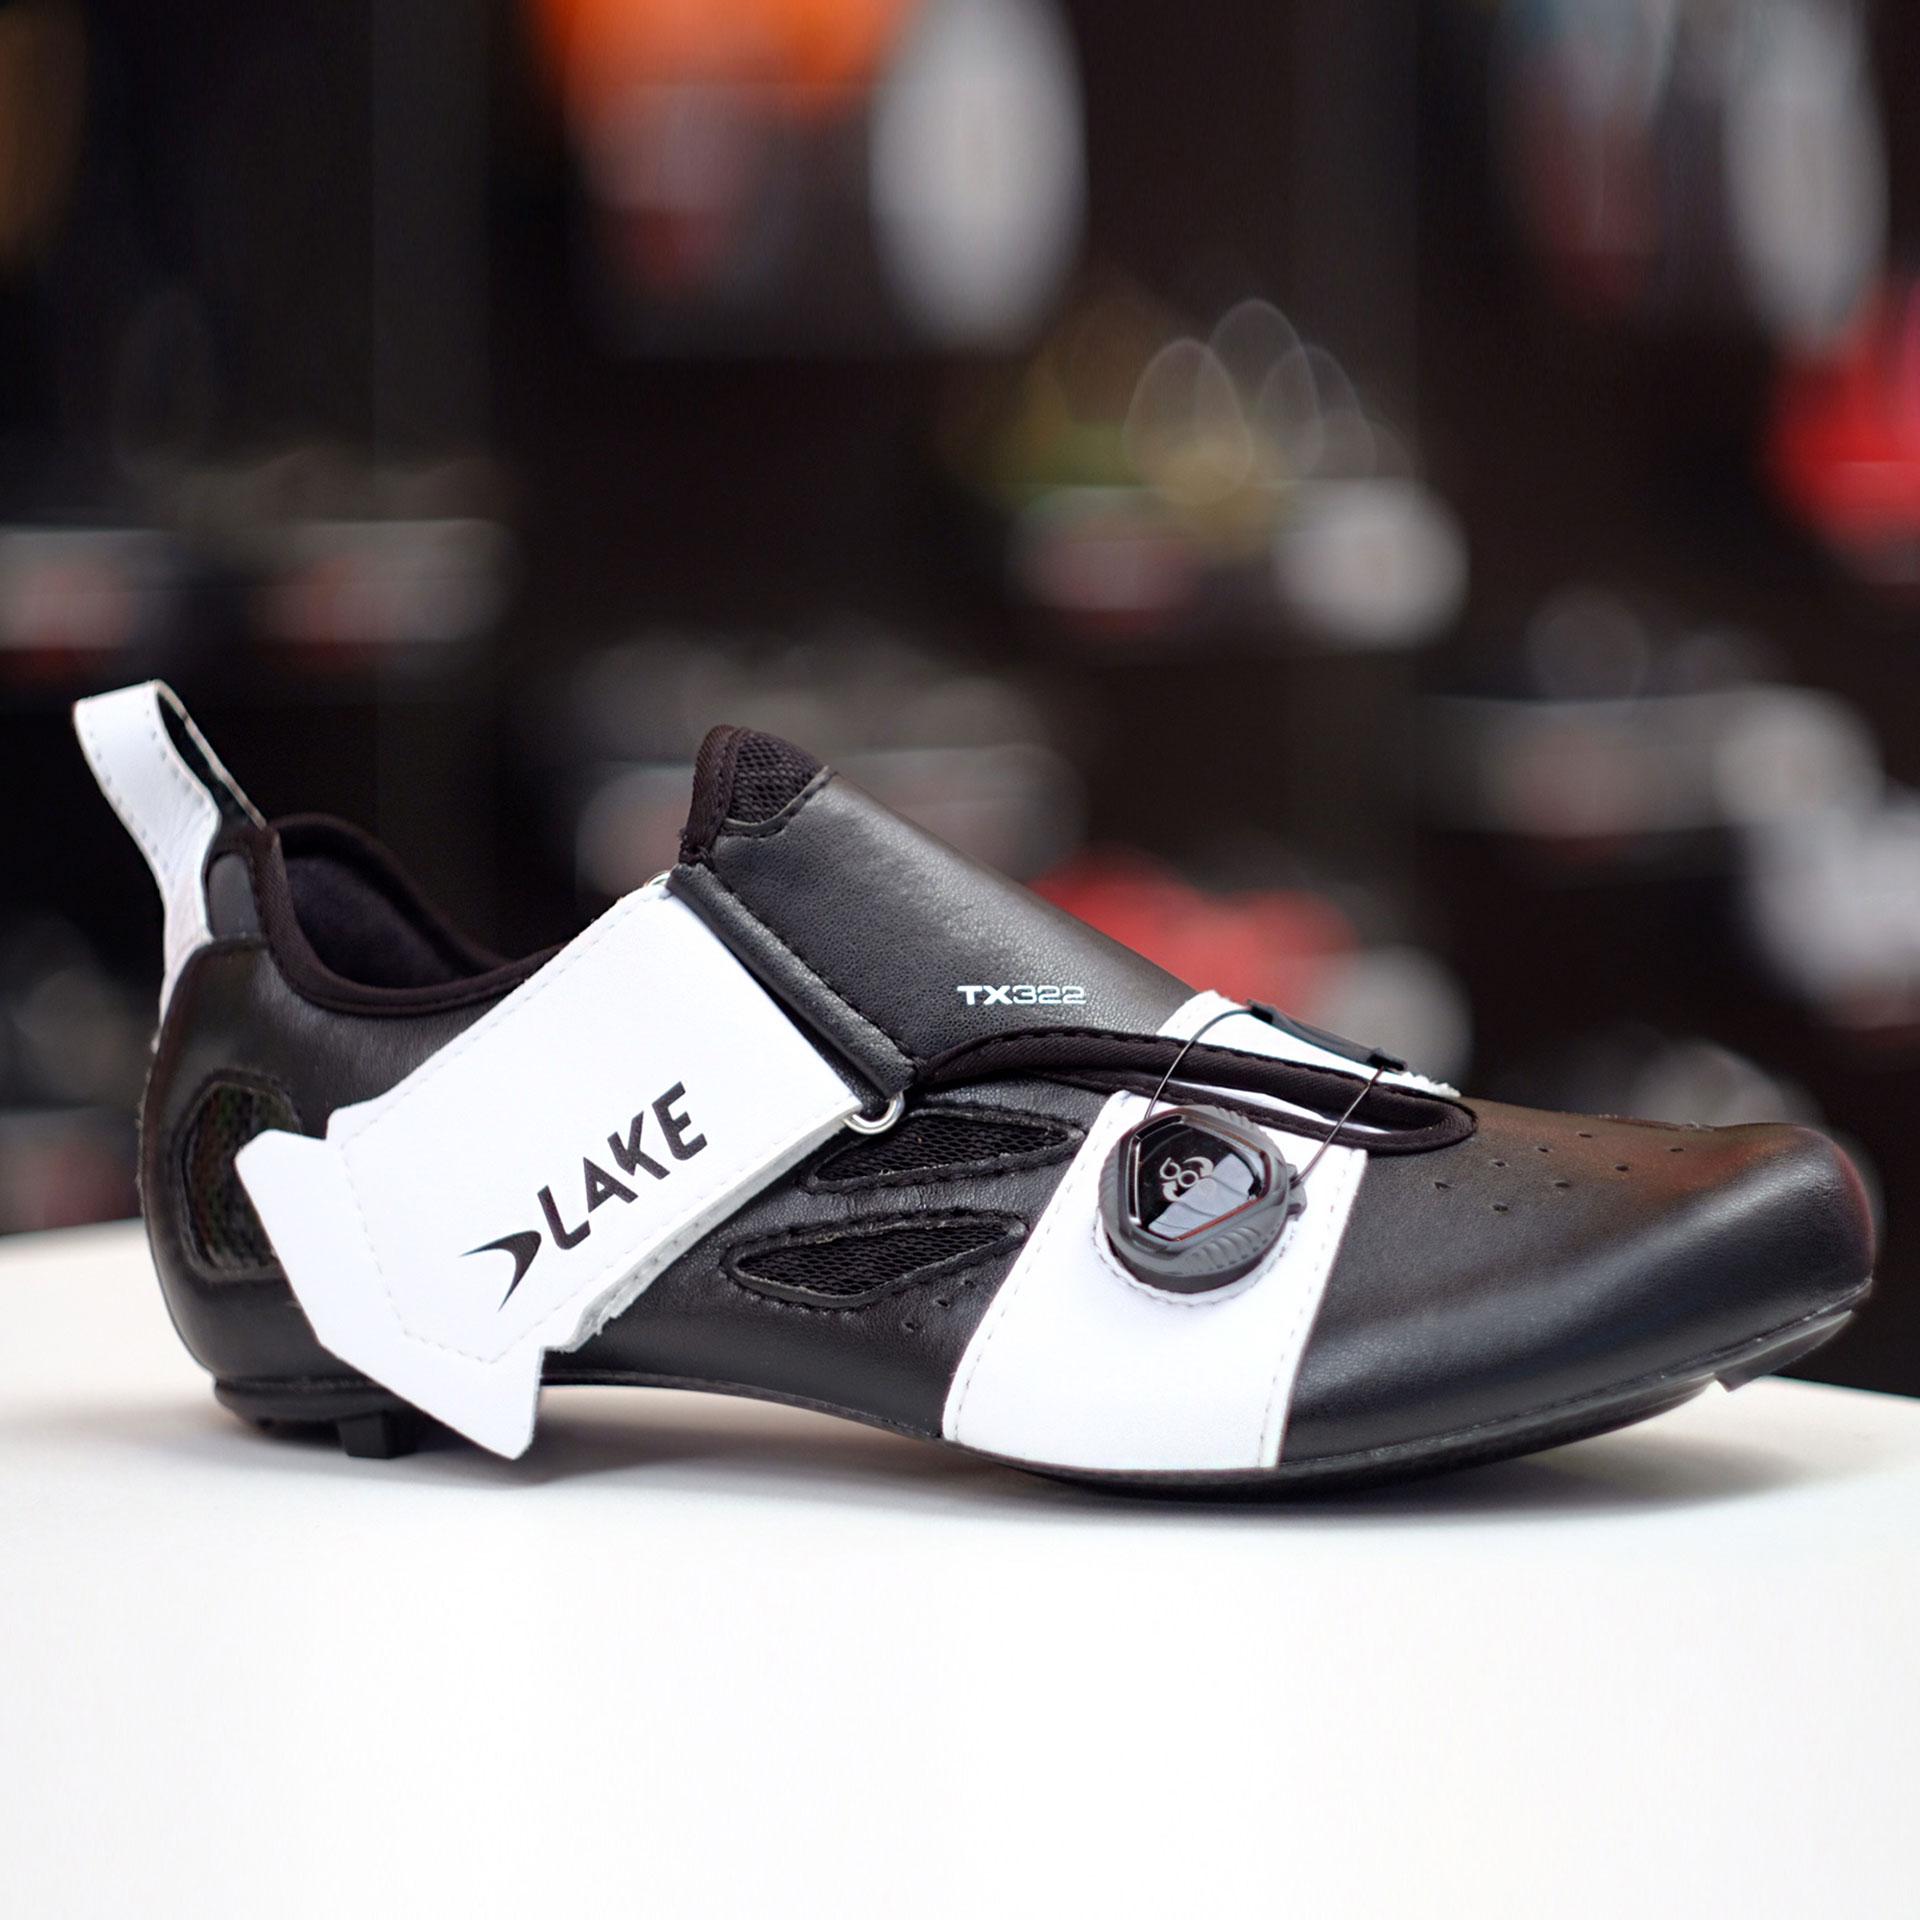 Lake TX322 triathlon shoe